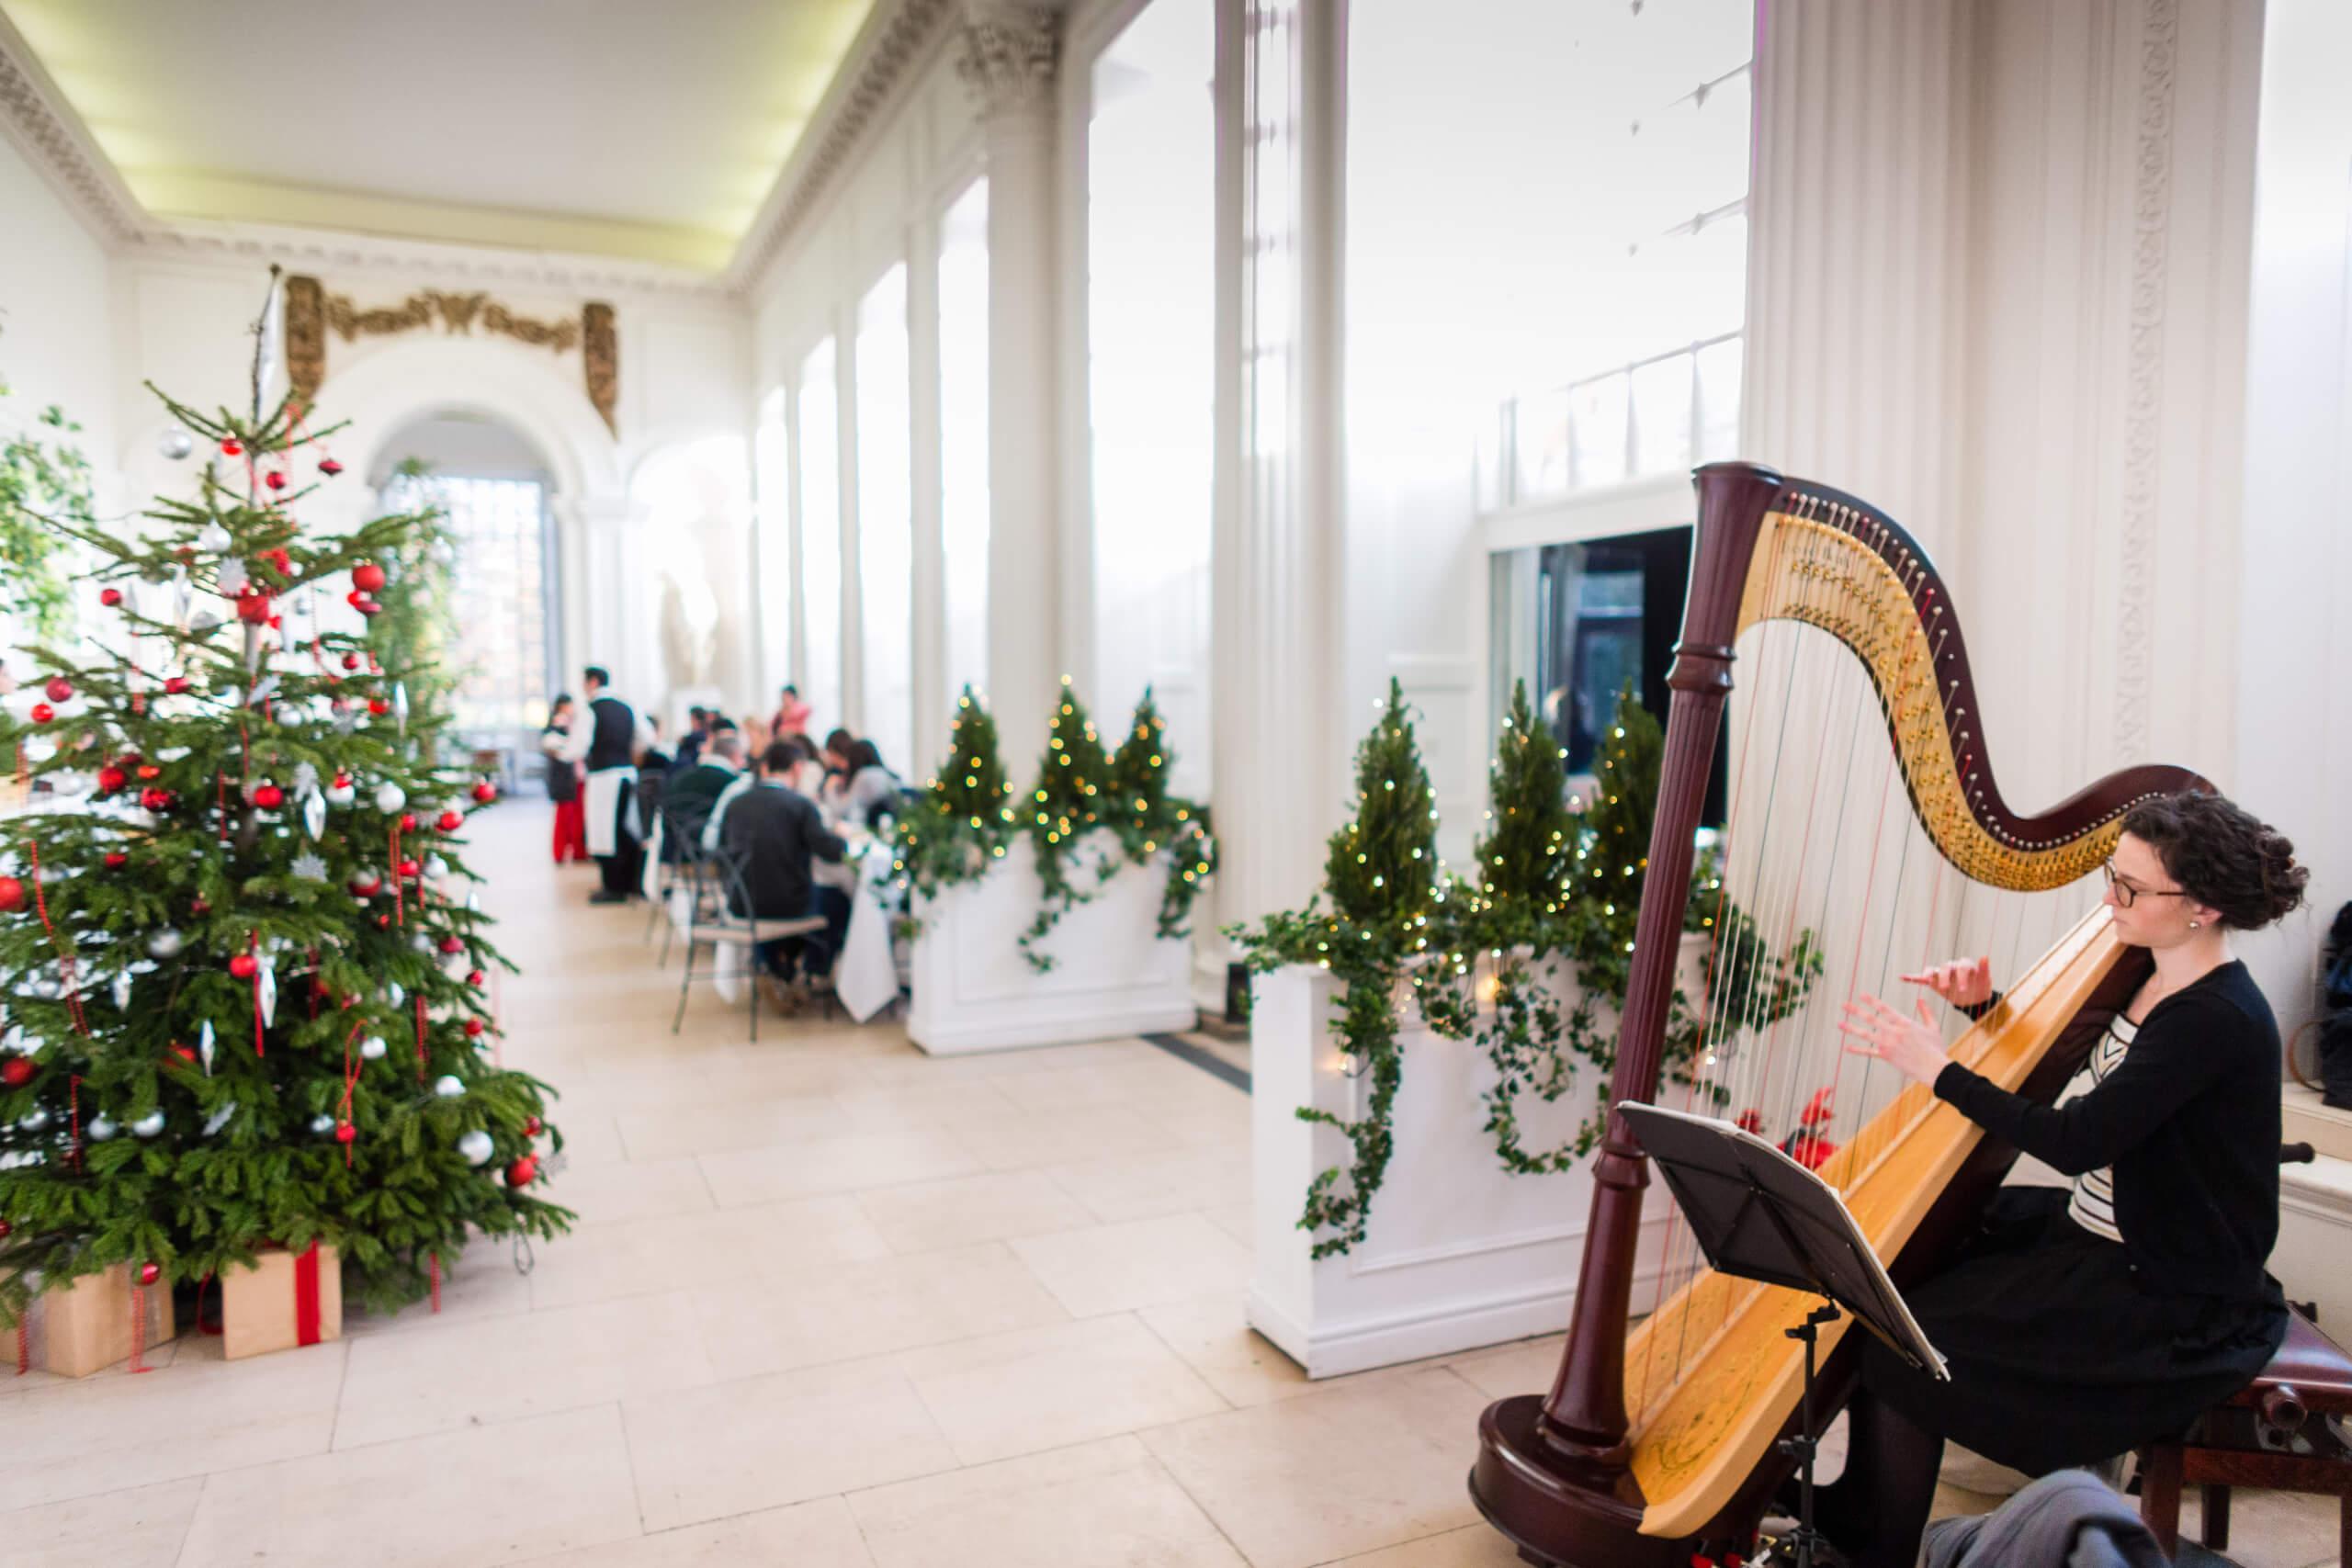 Christmas in London, christmas lunch london, christmas lunch in london, best christmas lunch london, christmas day lunch london, christmas lunches in london, christmas lunches london, best christmas lunch in london, office christmas lunch london, christmas lunch london bridge, christmas day lunch in london, london christmas lunch, christmas lunch menu london